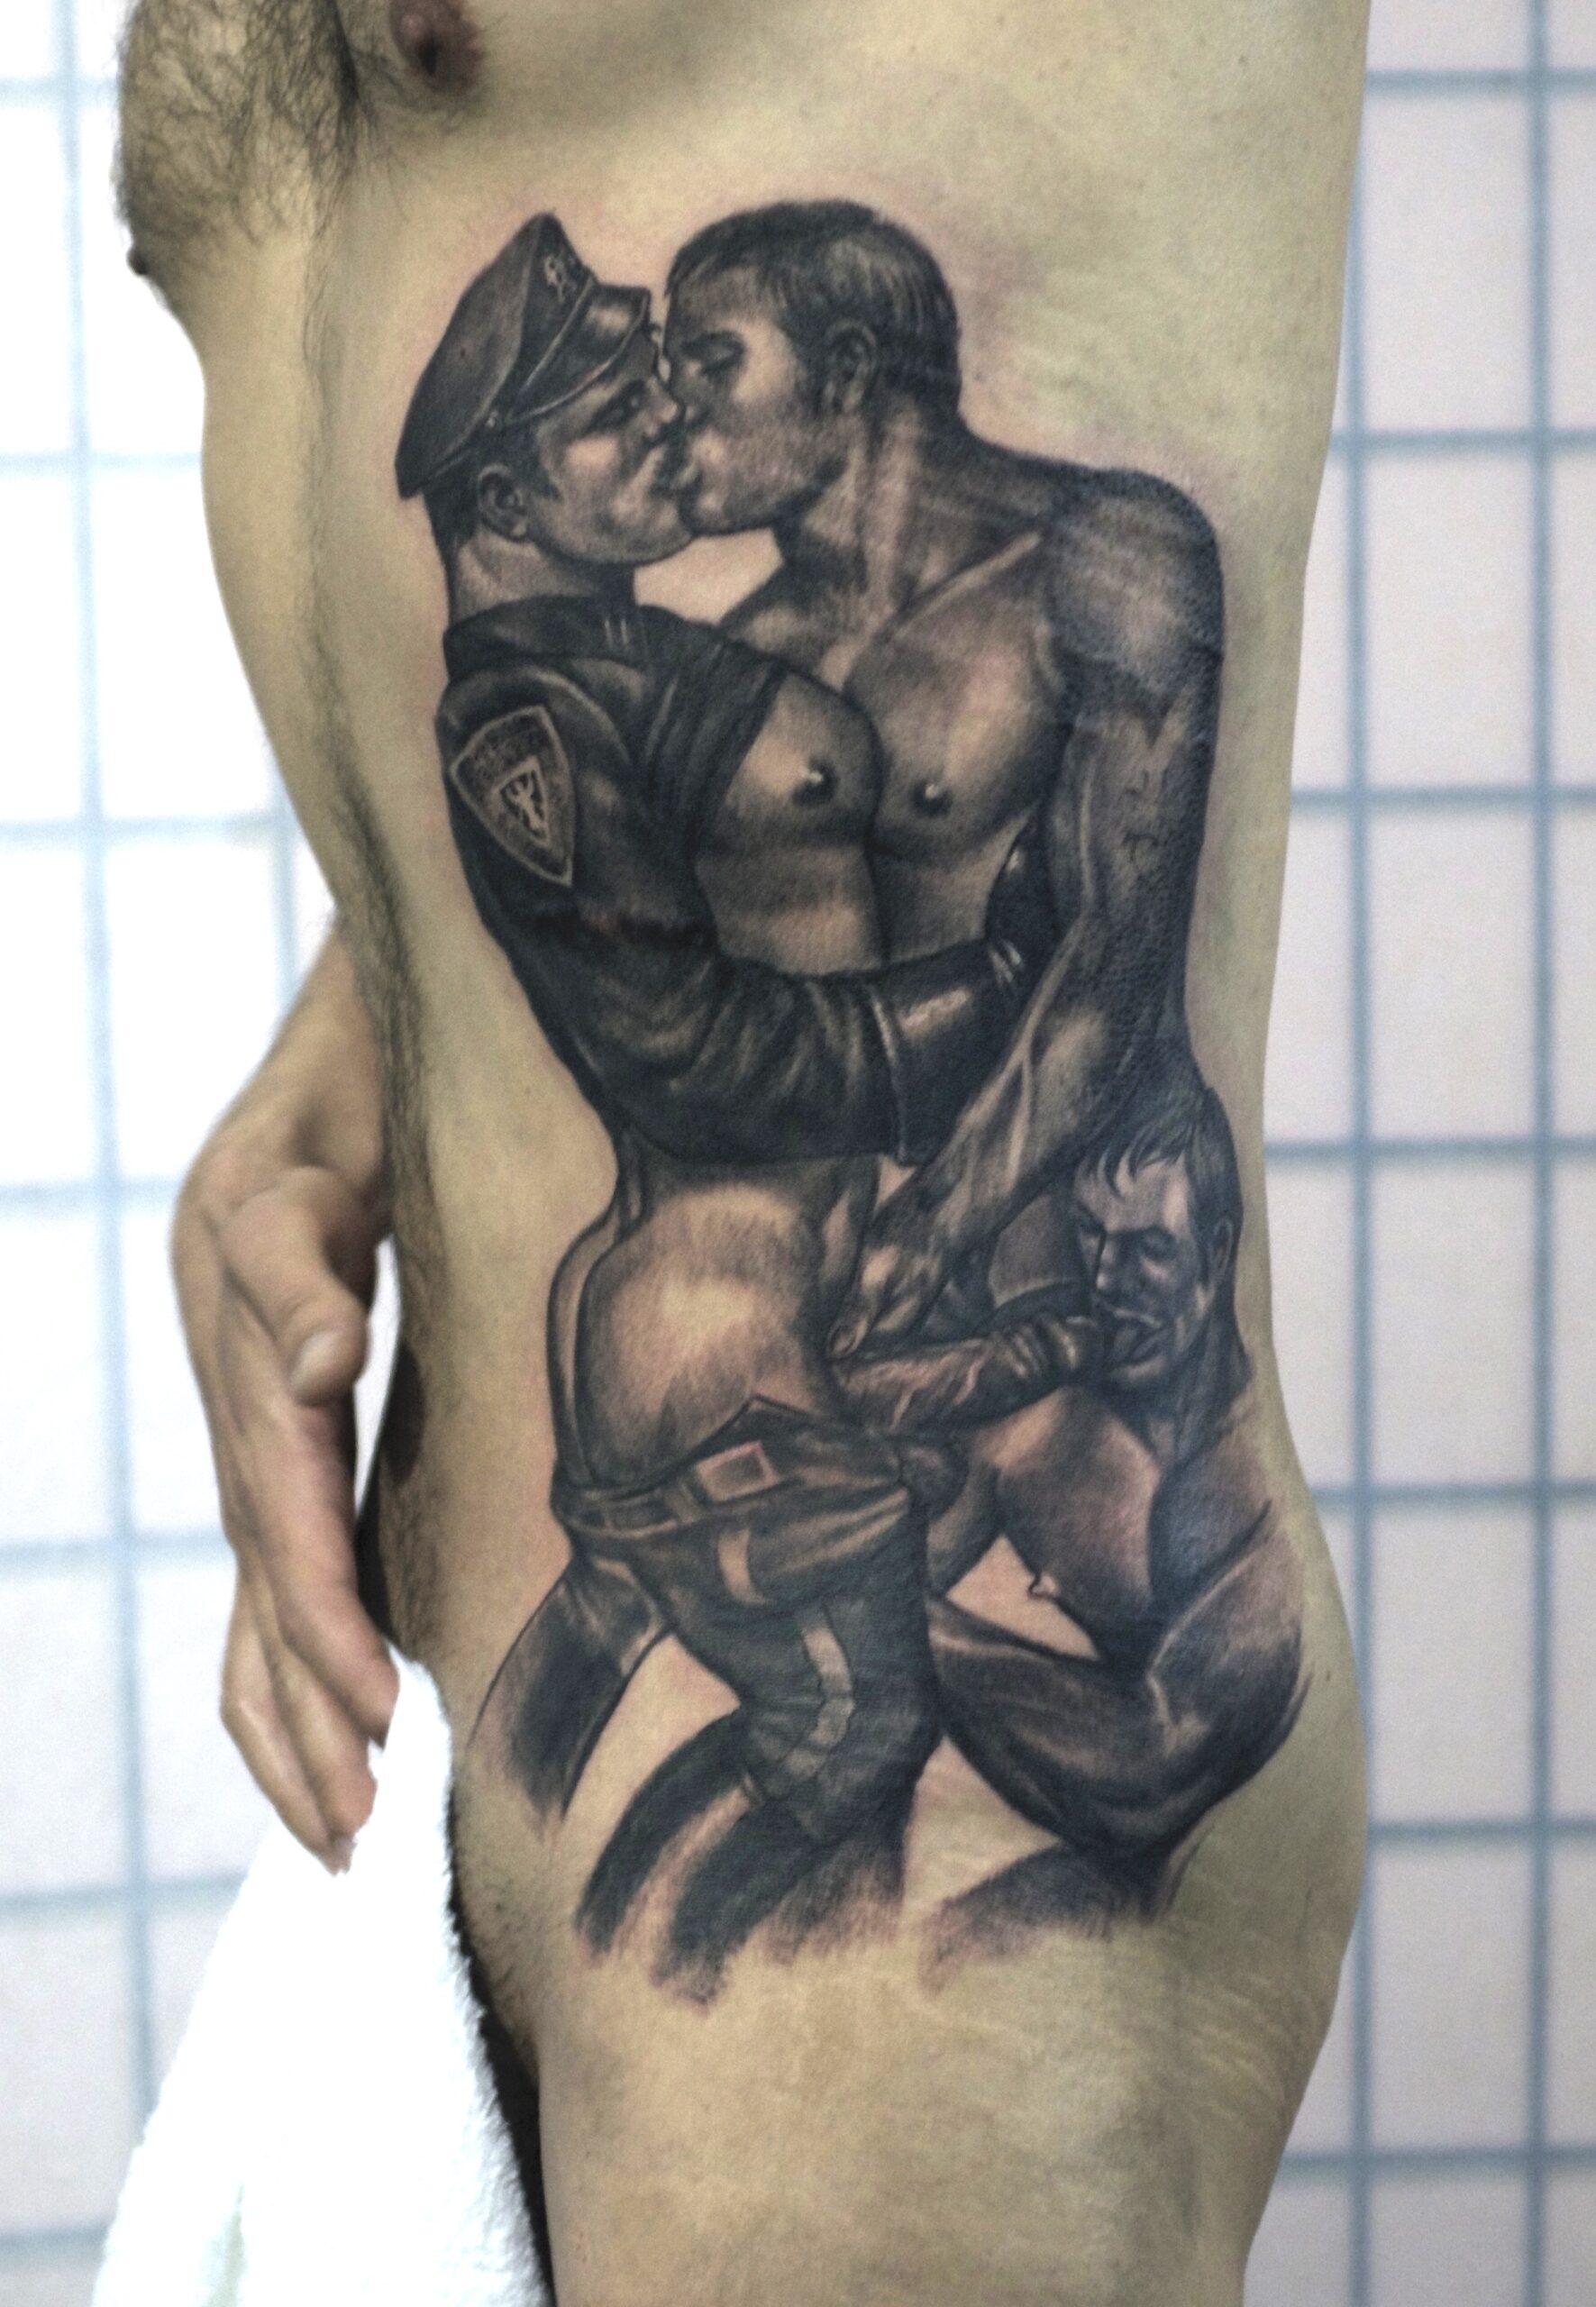 zhuo dan ting tattoo work tom of finland 1 1